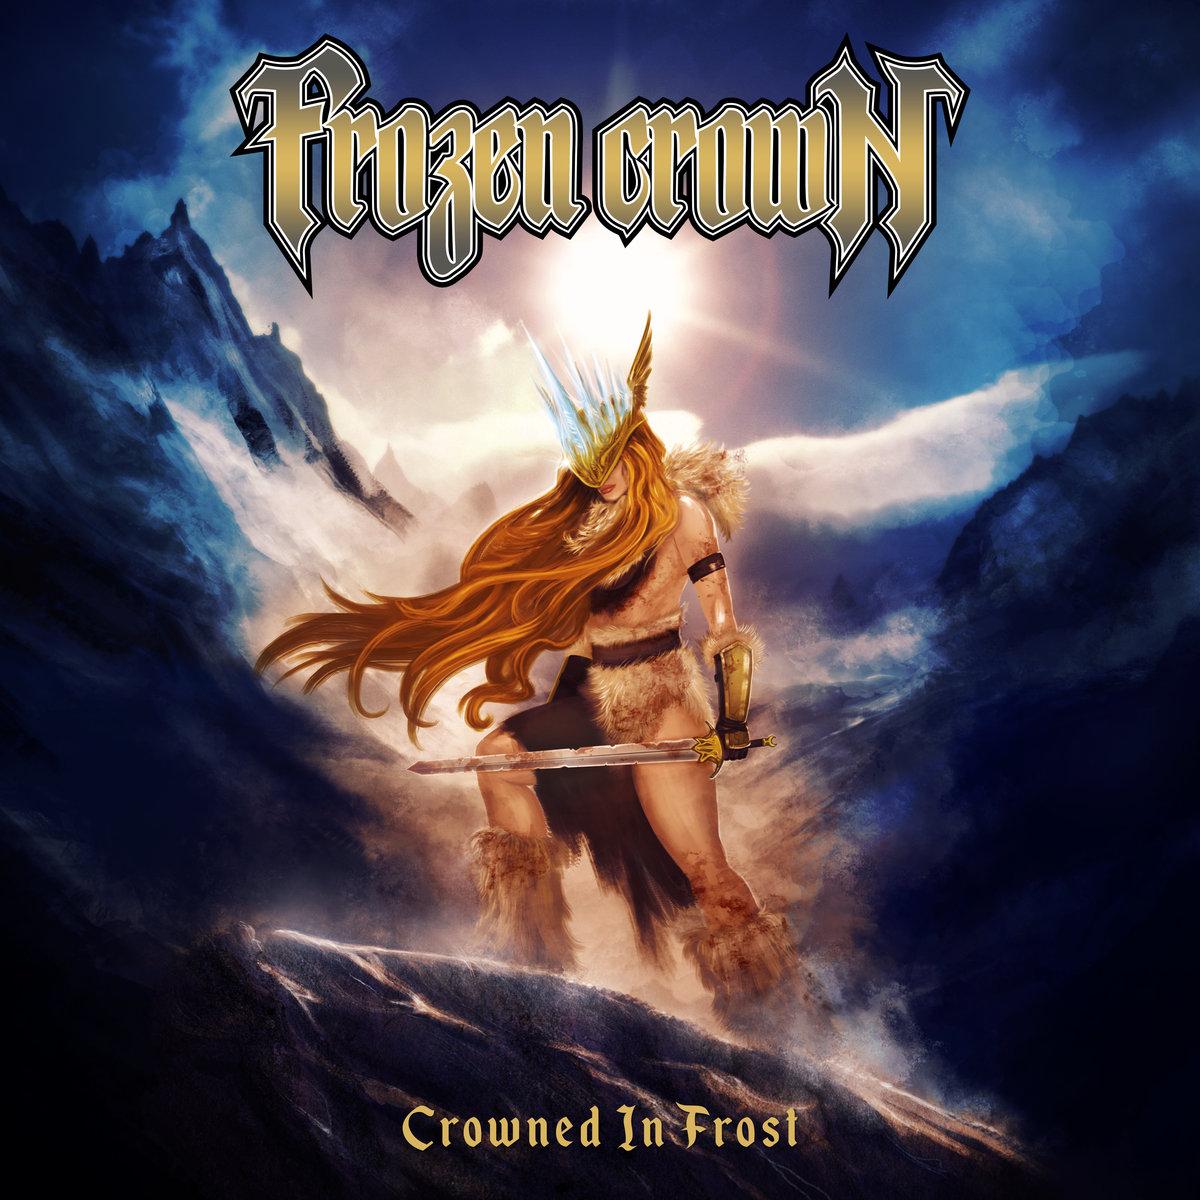 frozen crown-crowned in frost